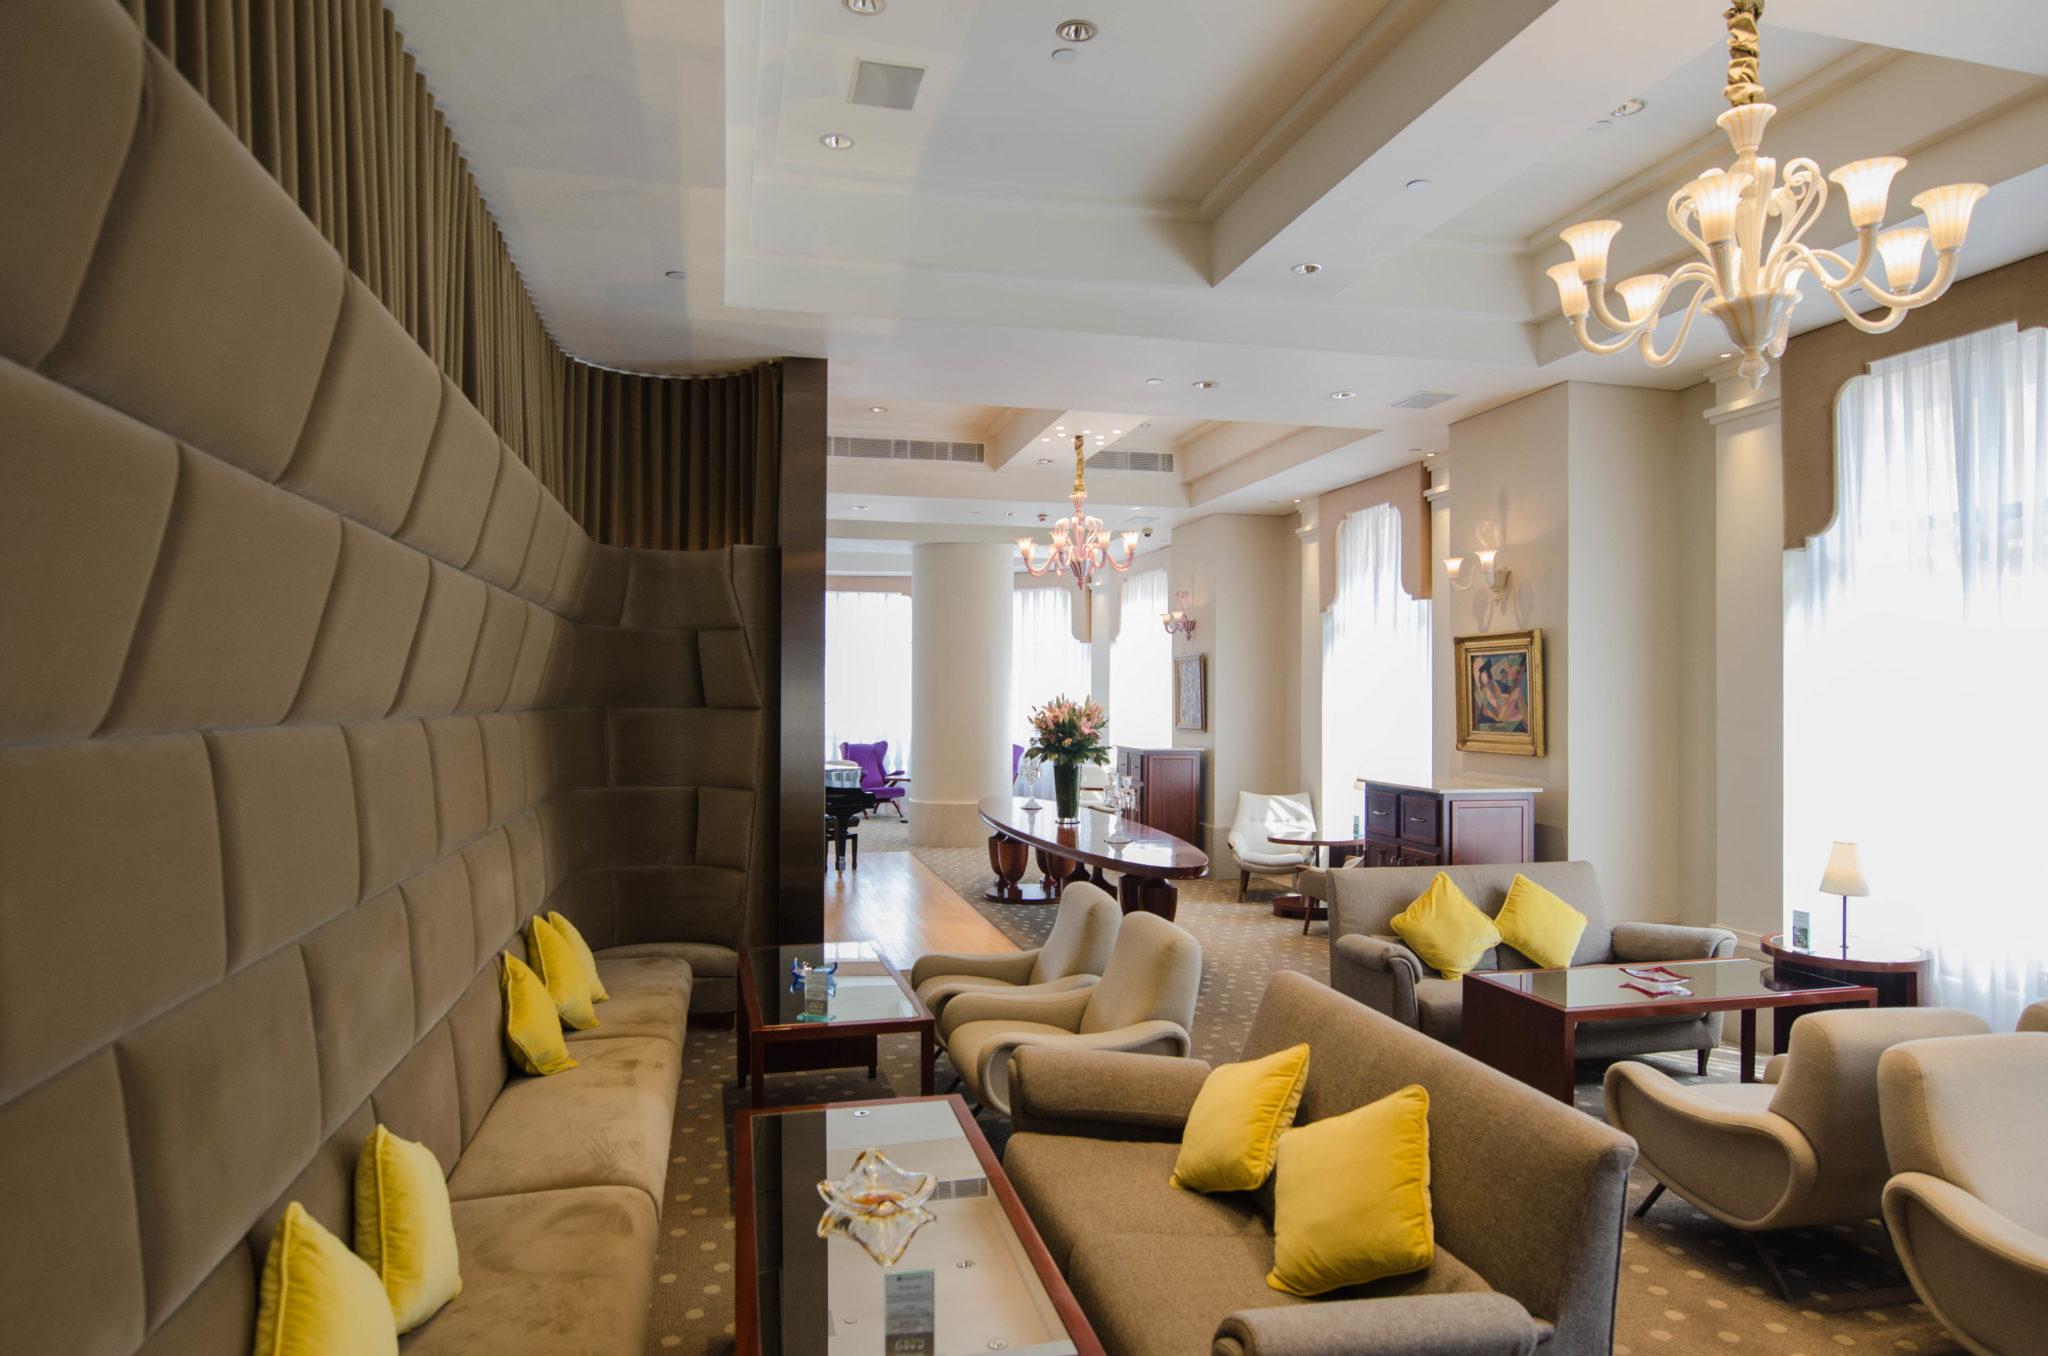 Lanson Place Hotel Hongkong: In der Lobby fühlt man sich direkt zu Hause